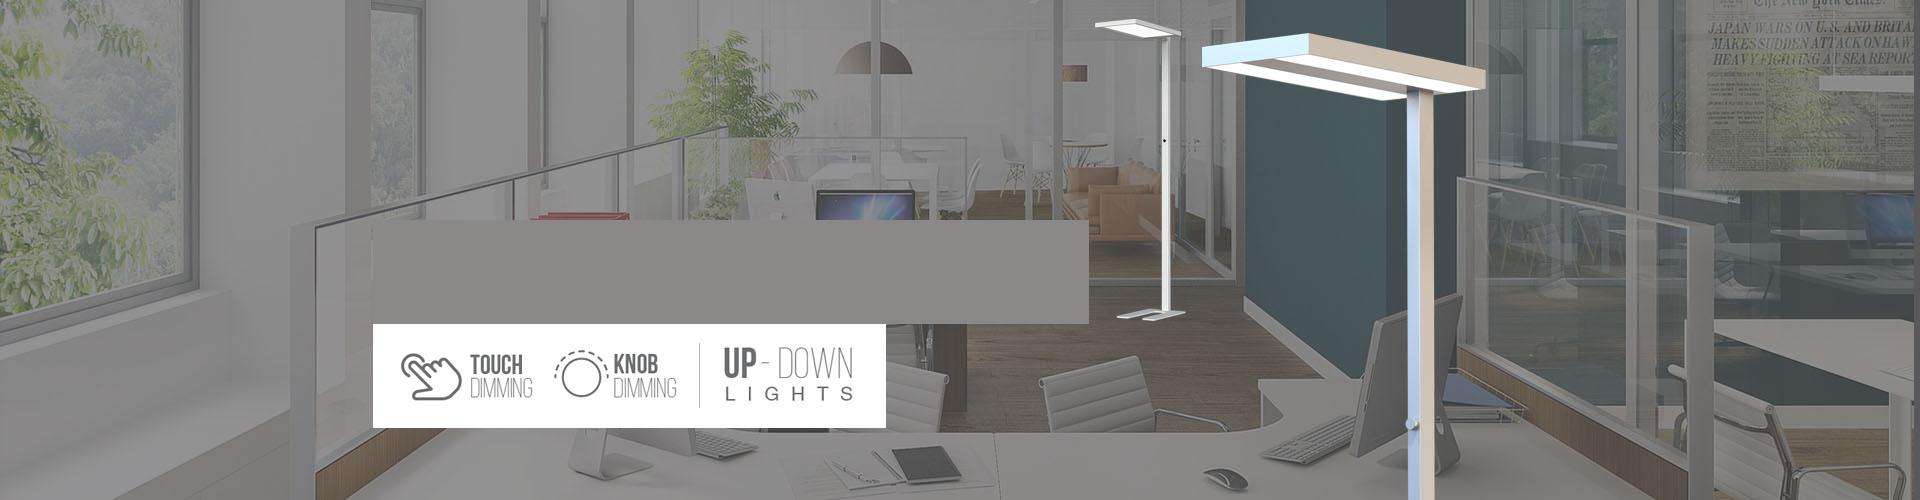 Lampade a piantana a LED da pavimento marchiate V-TAC